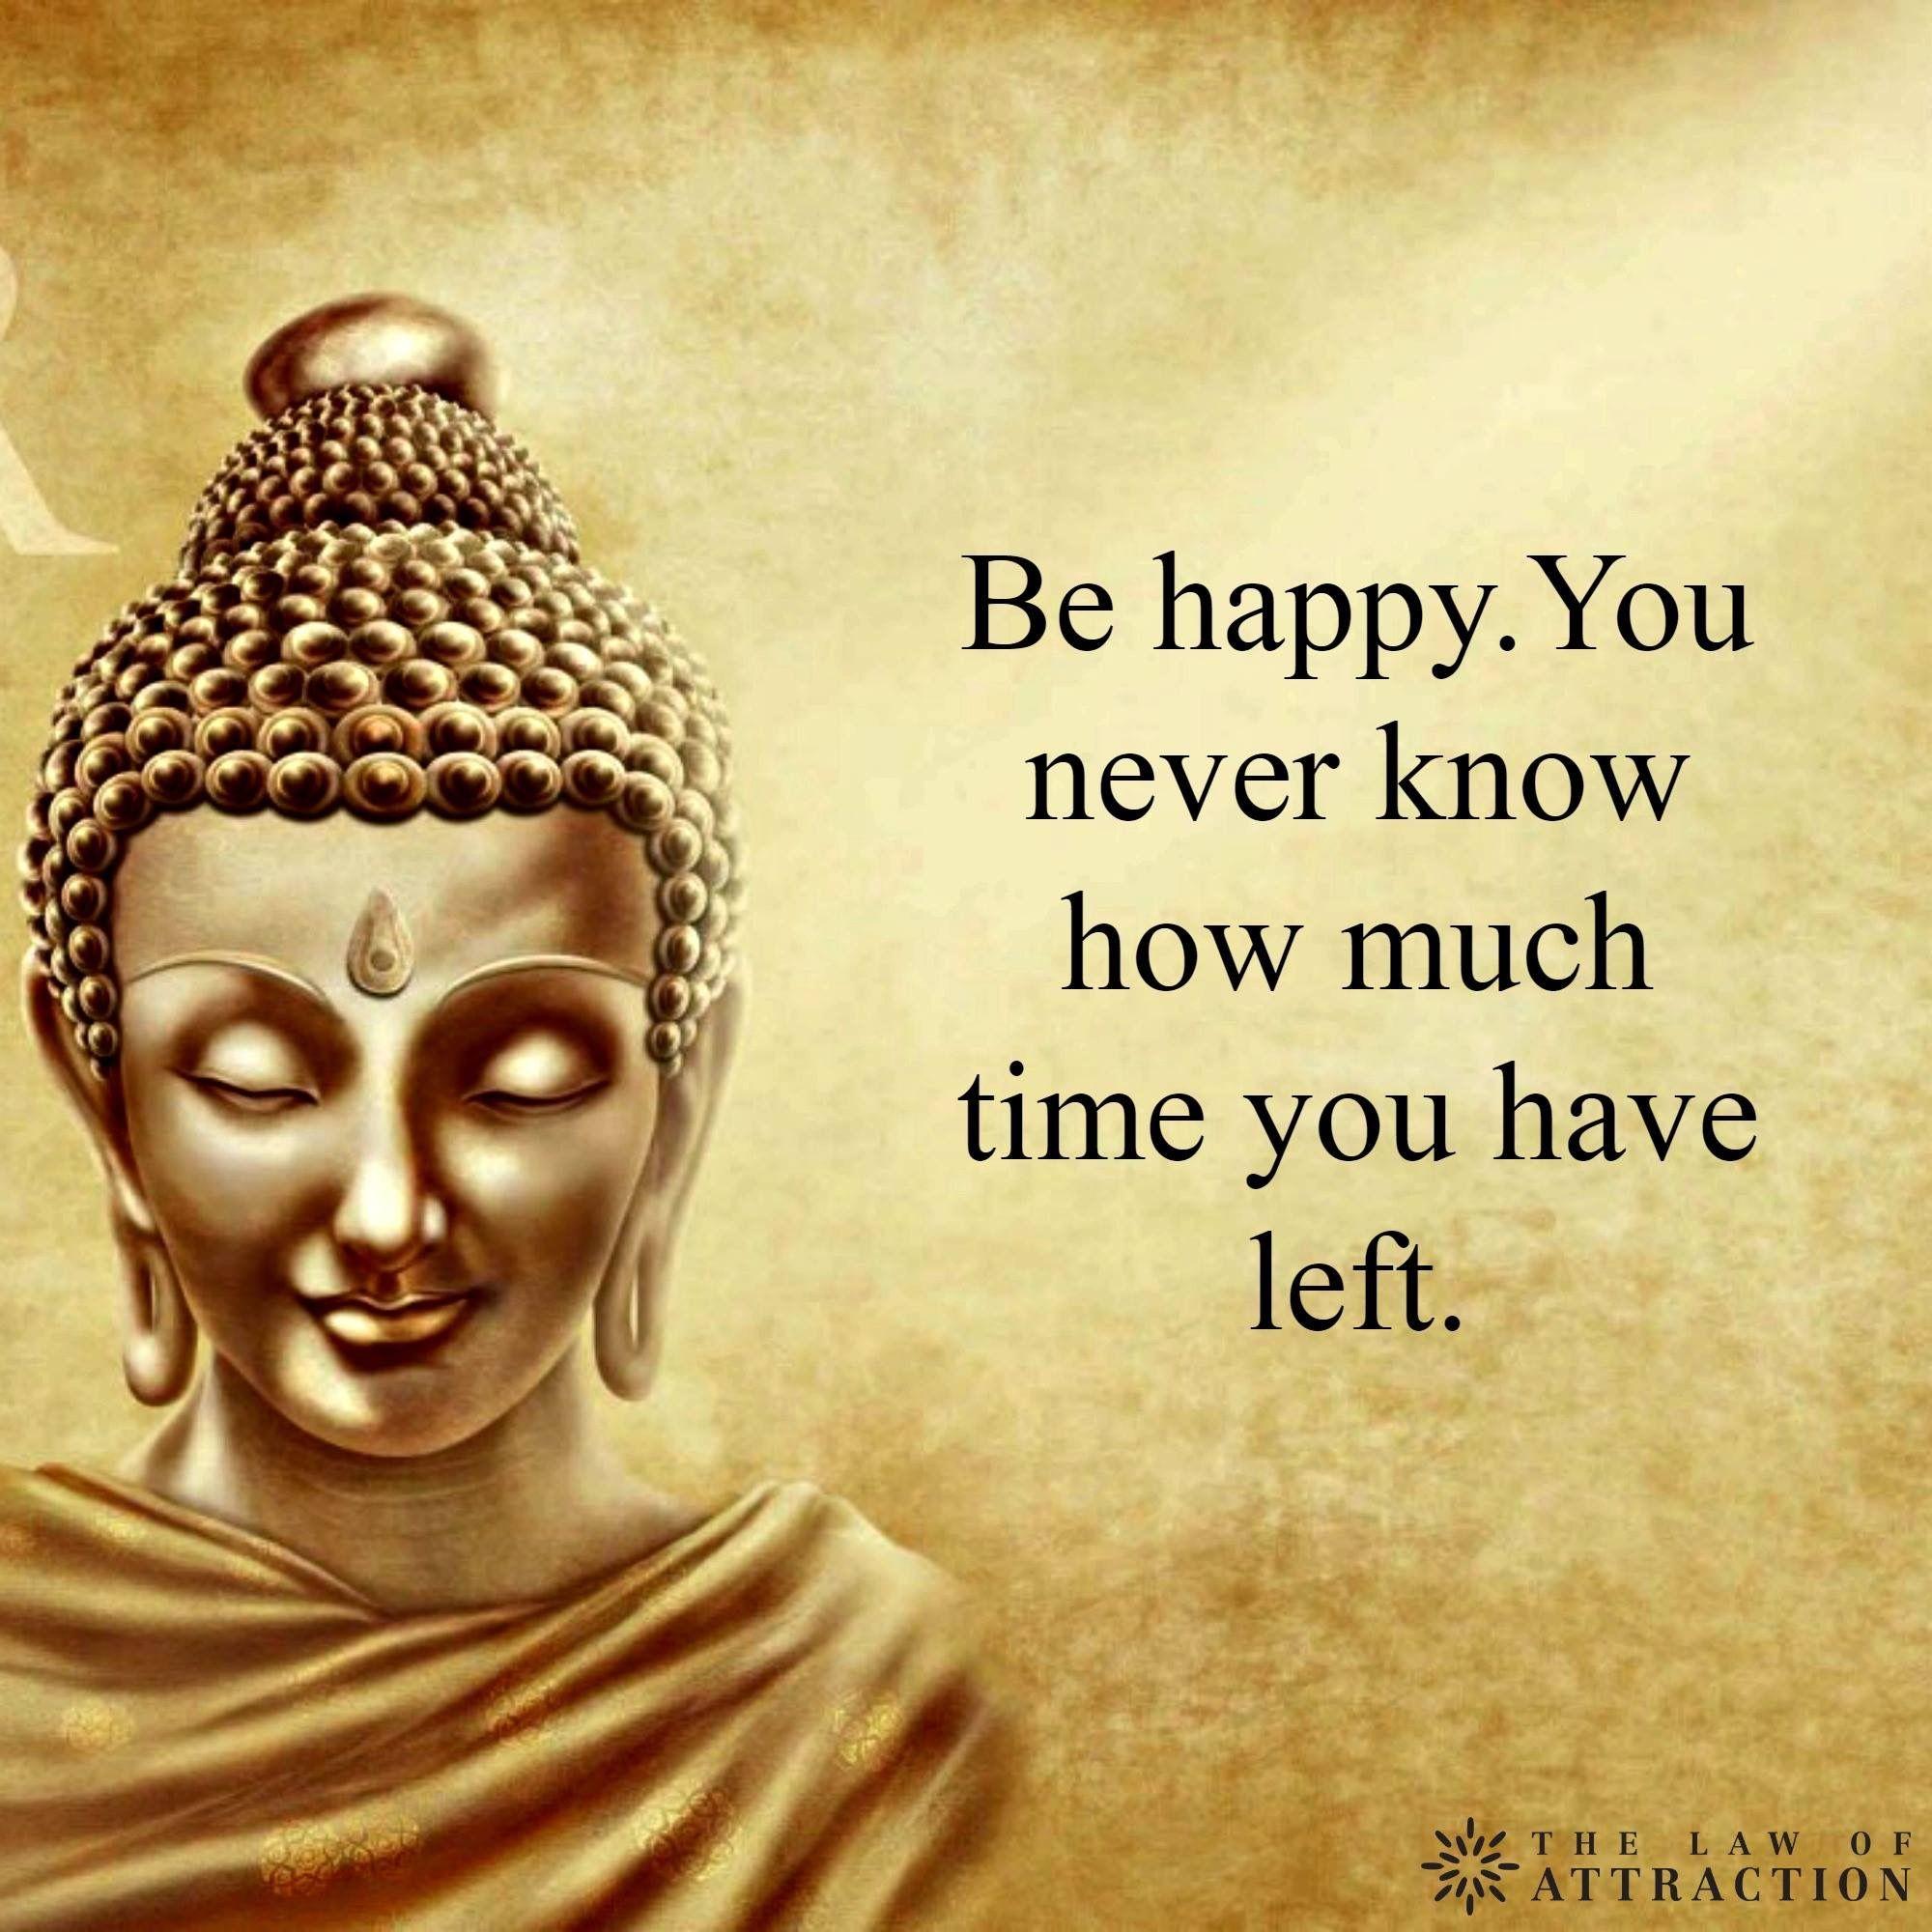 Buddha Quotes On Life: Pin By Nina D Martin On * SAYINGS I LIKE *